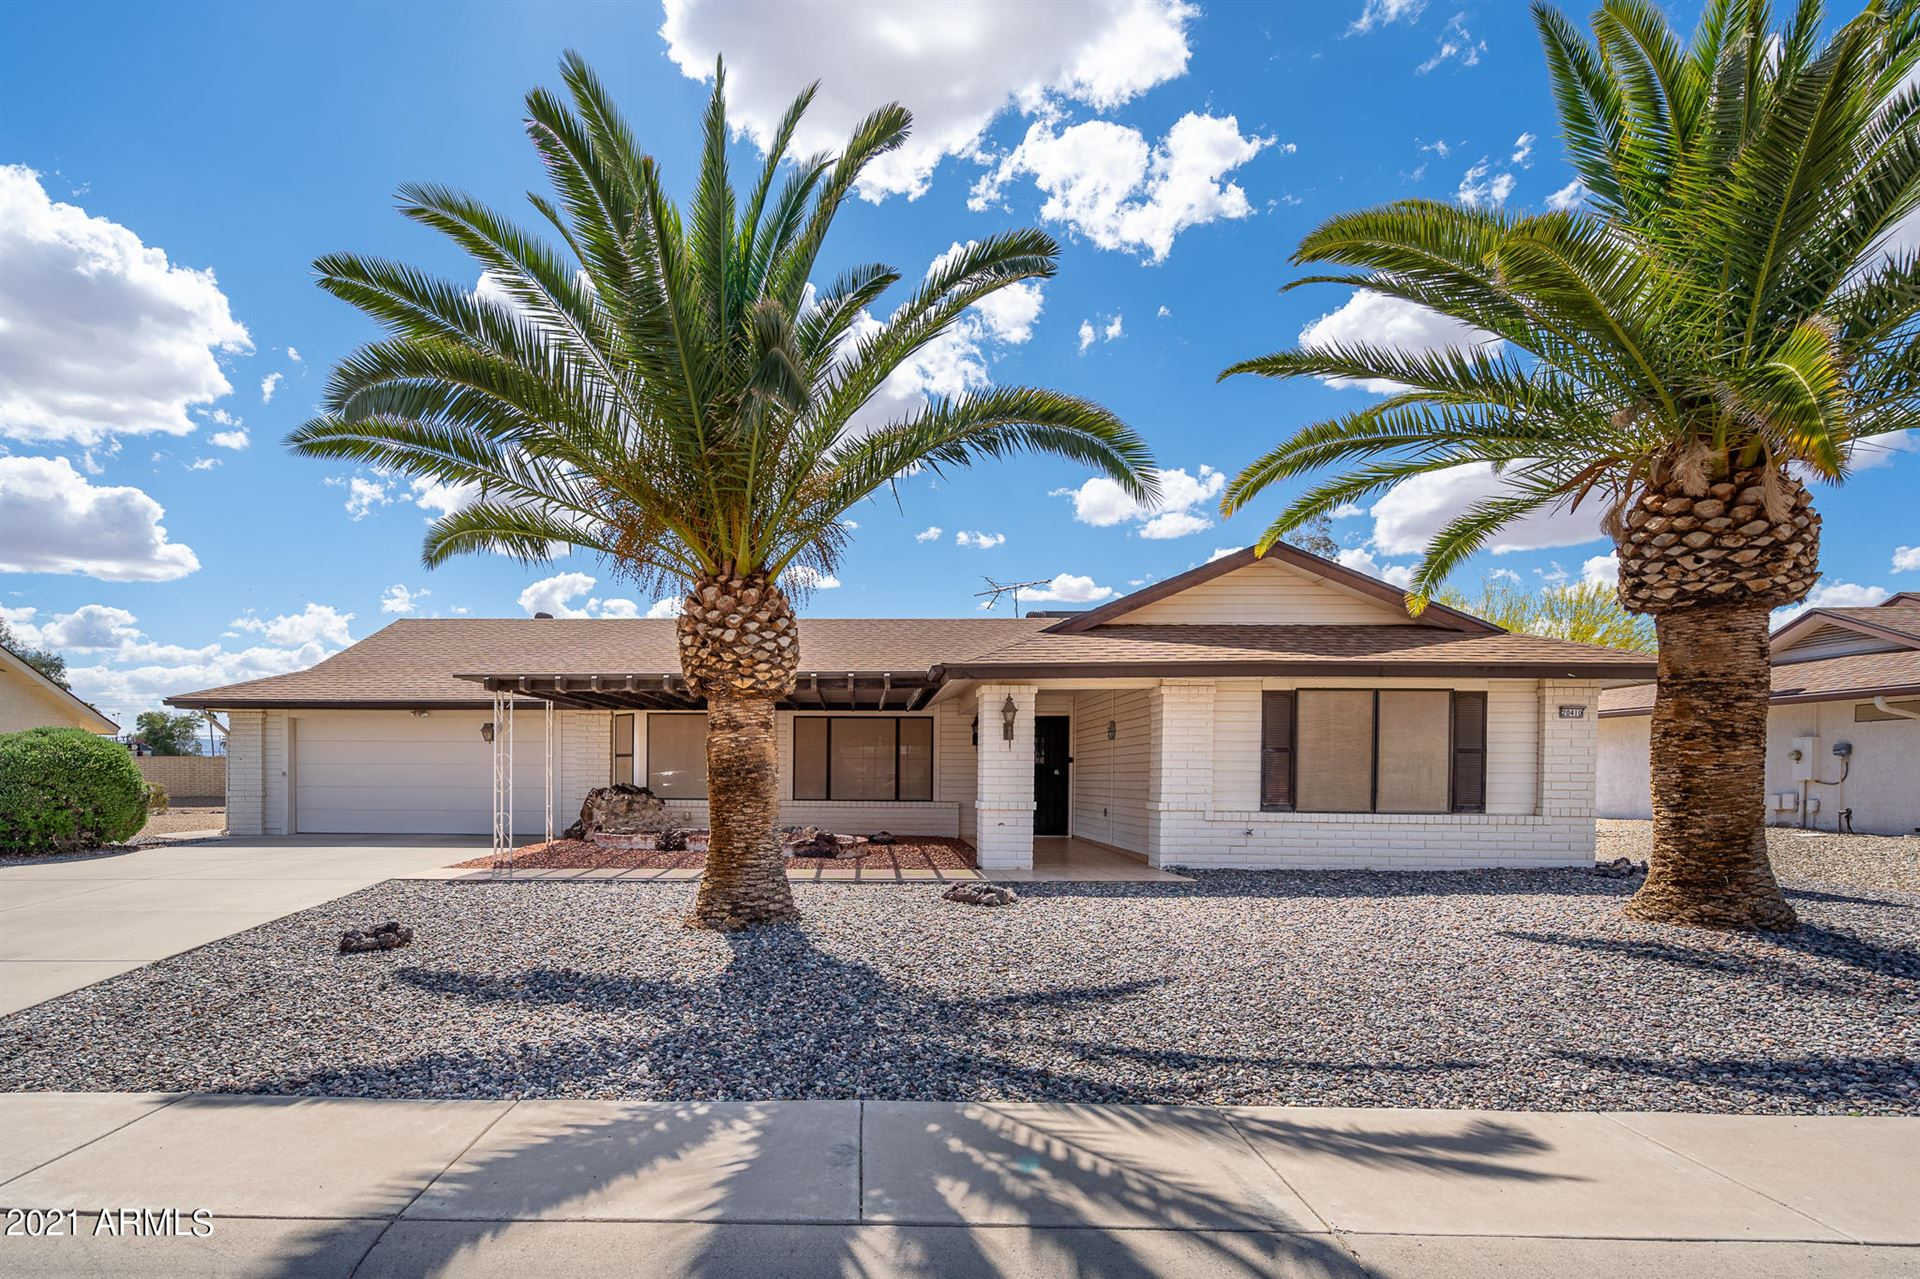 Photo of 20410 N DESERT GLEN Drive, Sun City West, AZ 85375 (MLS # 6228984)